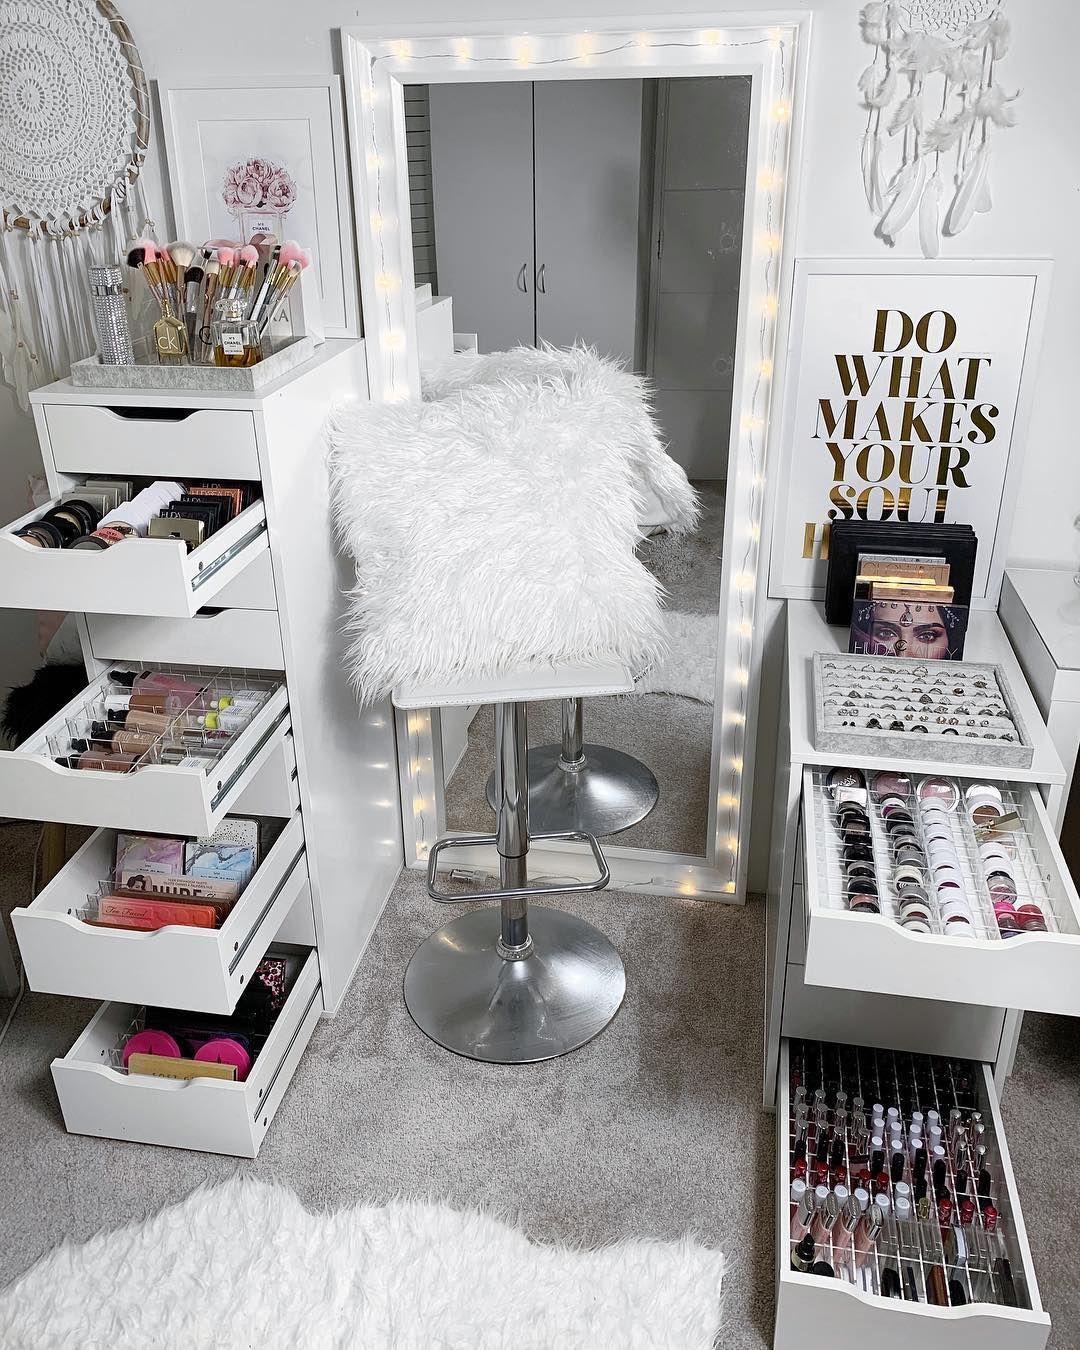 19 Beautiful Makeup Room Ideas, Organizer and Decorating